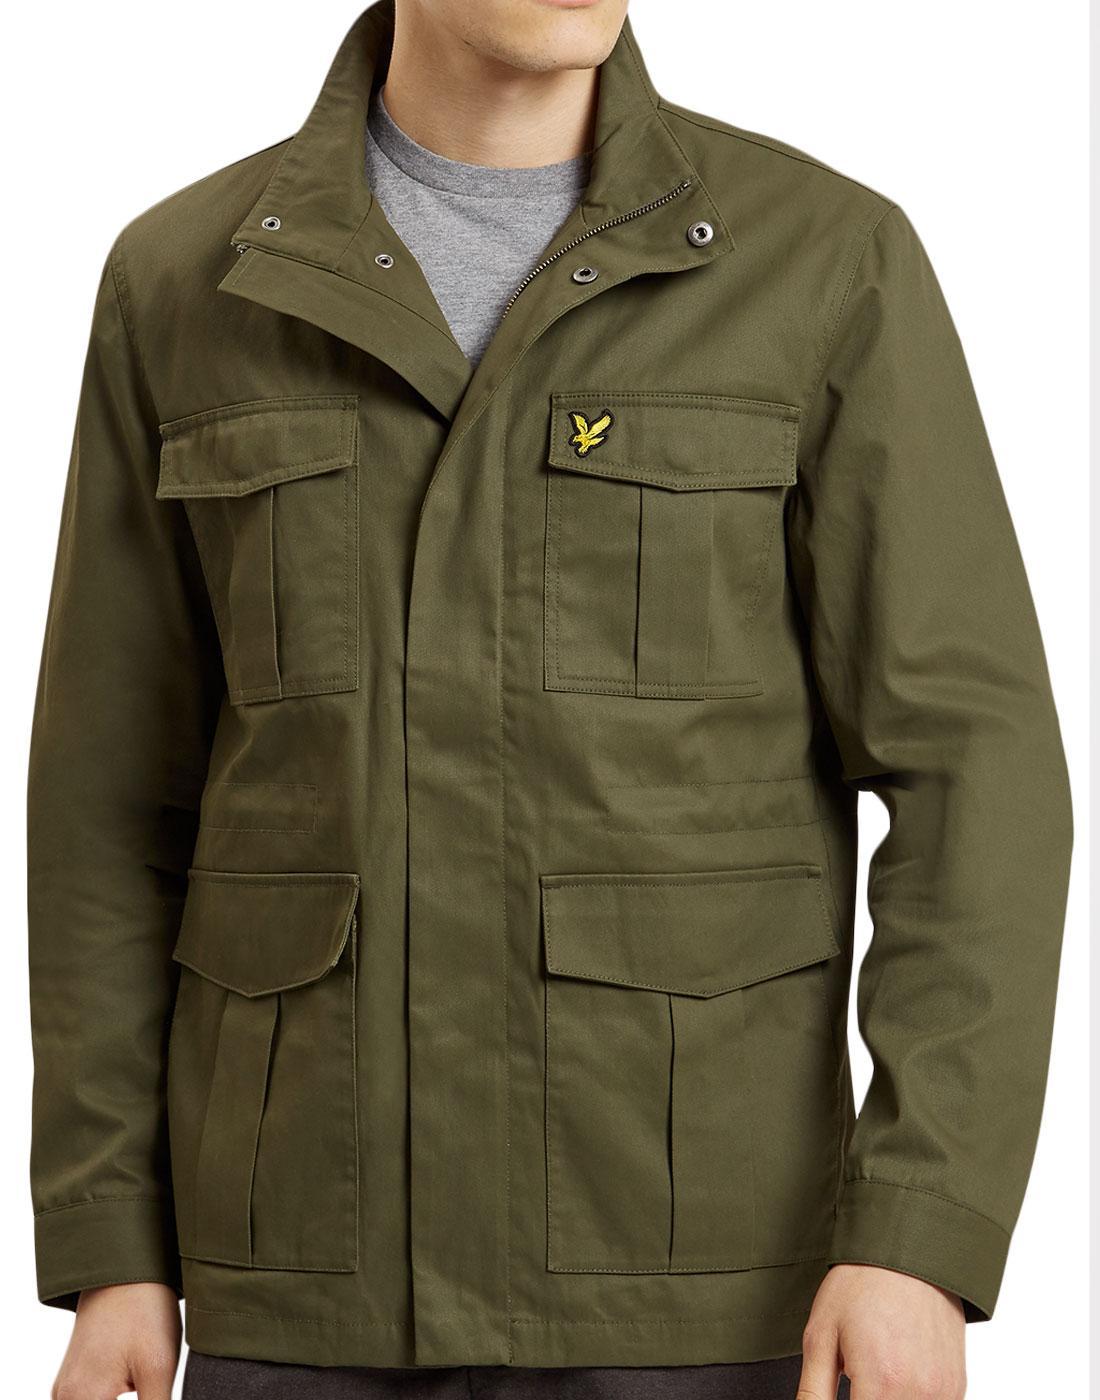 LYLE & SCOTT Retro Mod Military Field Jacket OLIVE